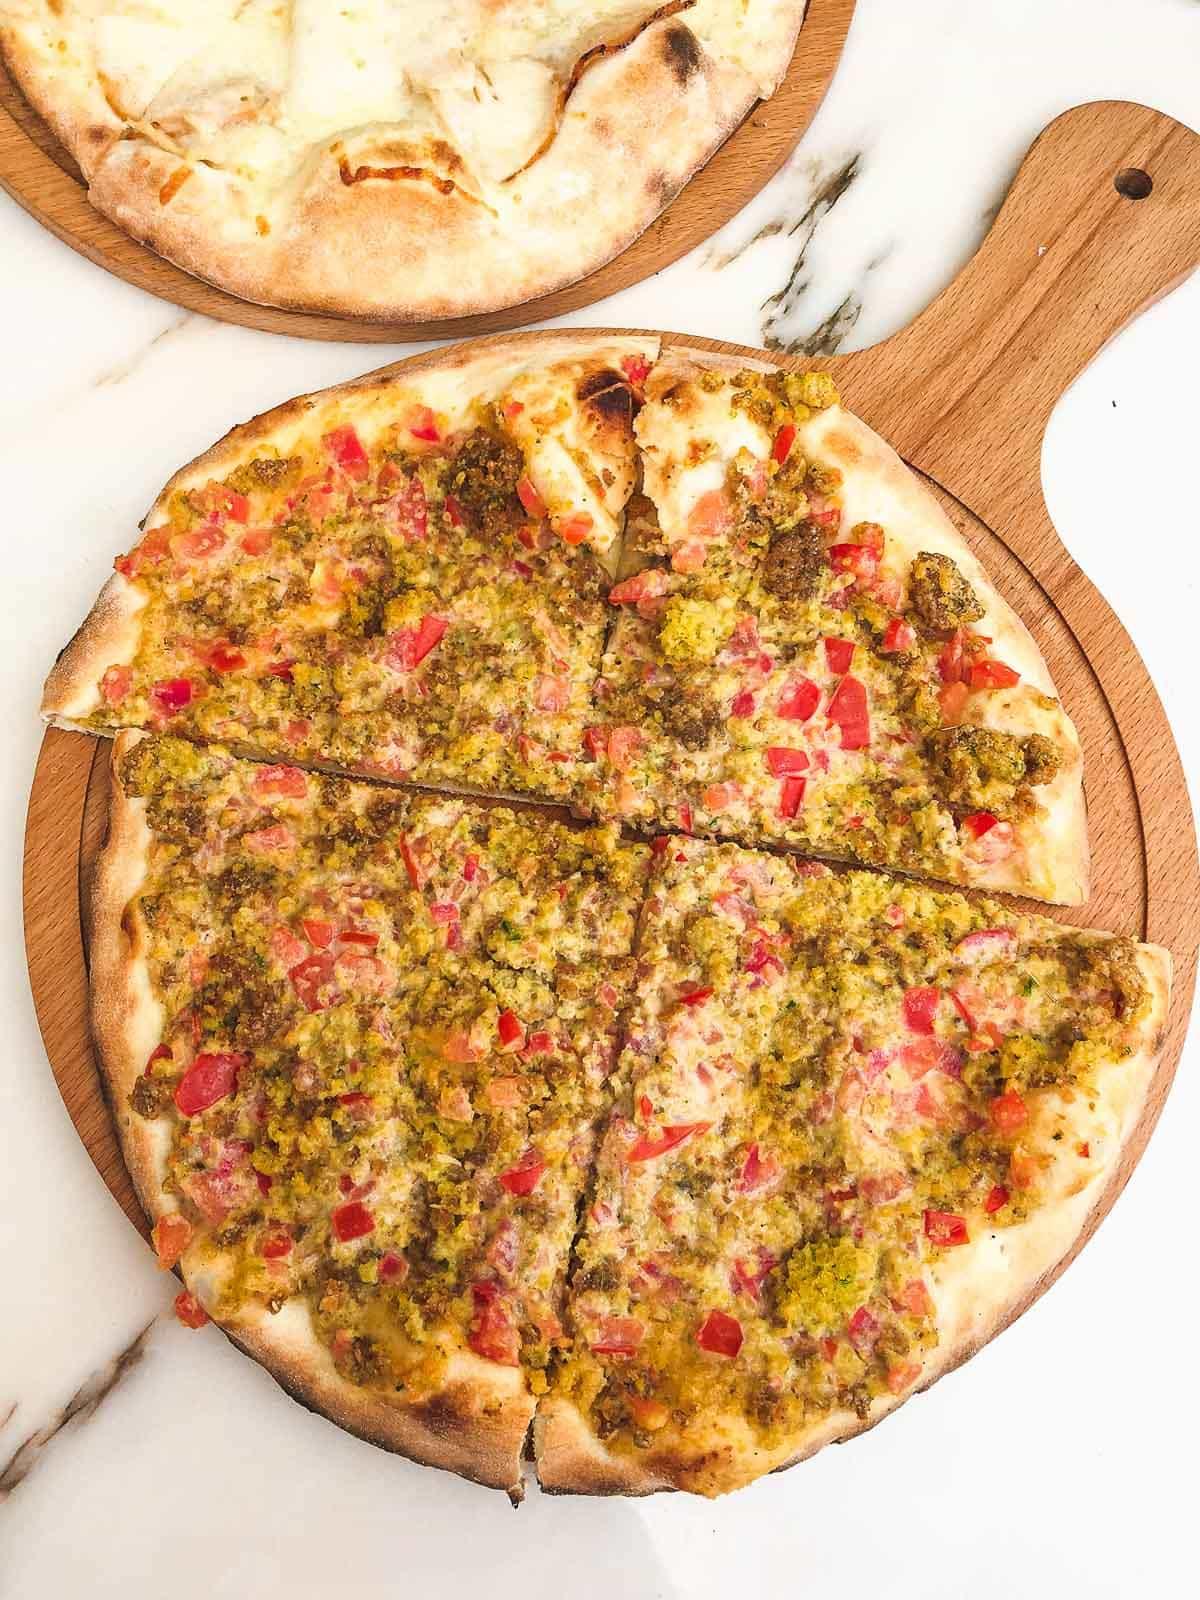 Manakeesh falafel